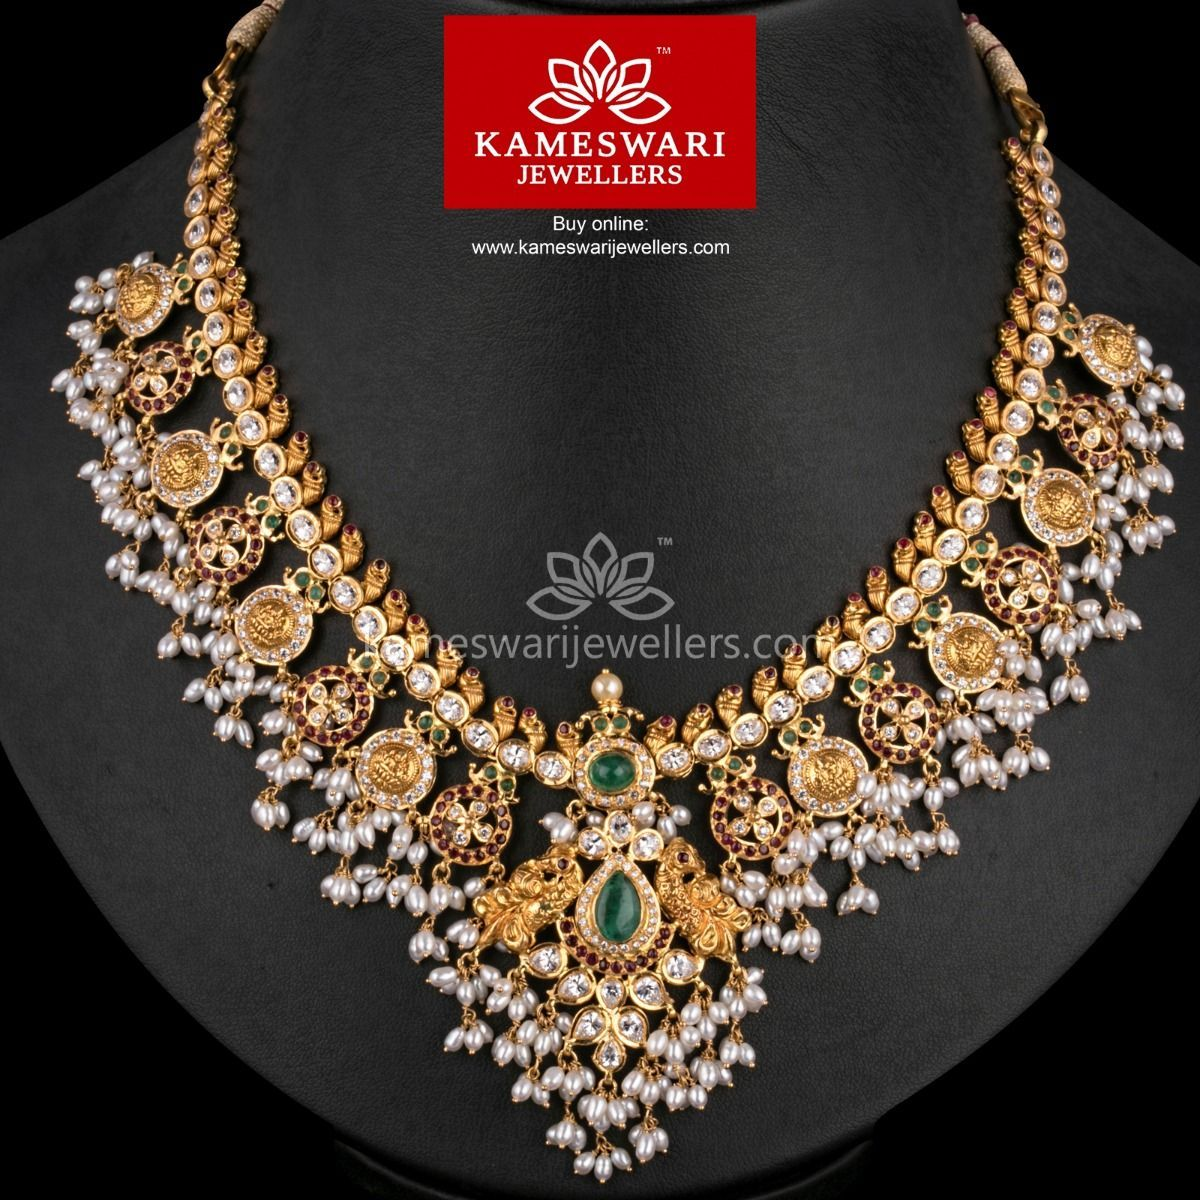 Buy Necklaces Online Short Guttapusalu Divine Blend From Kameswari Jewellers Gold Jewellery Design Necklaces Gold Jewelry Fashion Buy Necklace